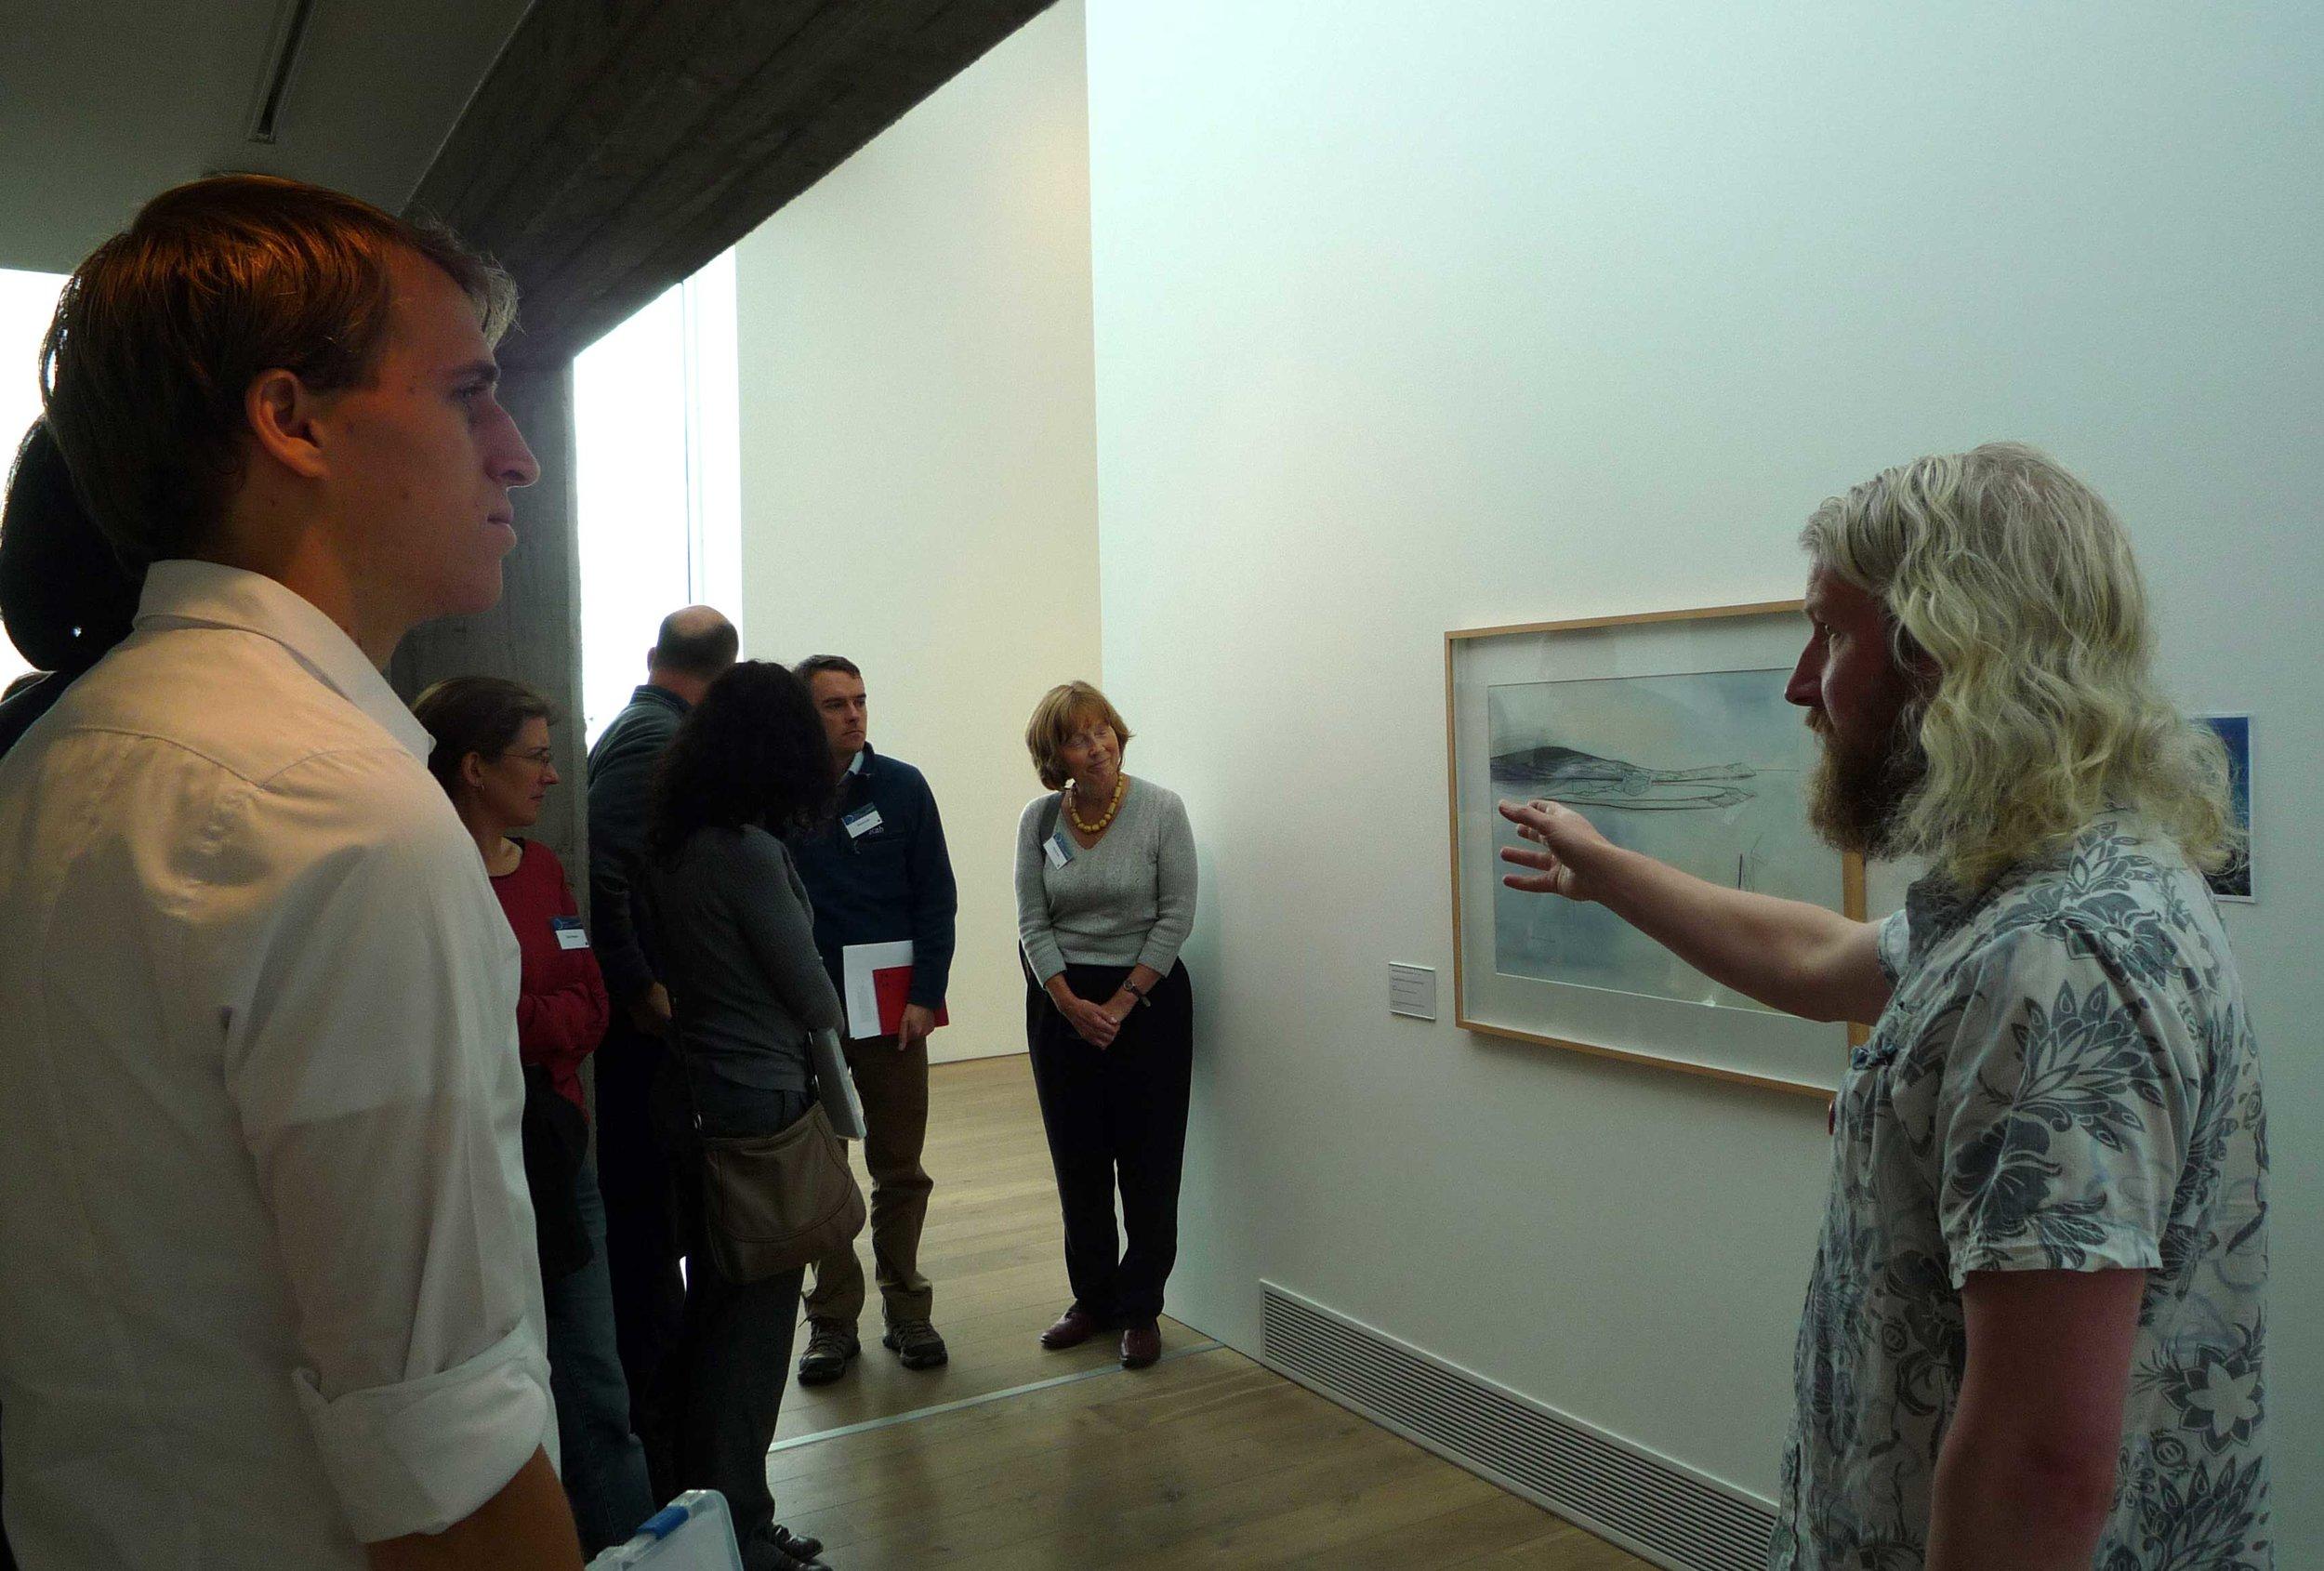 Study group tour of Pier Arts Centre Collection